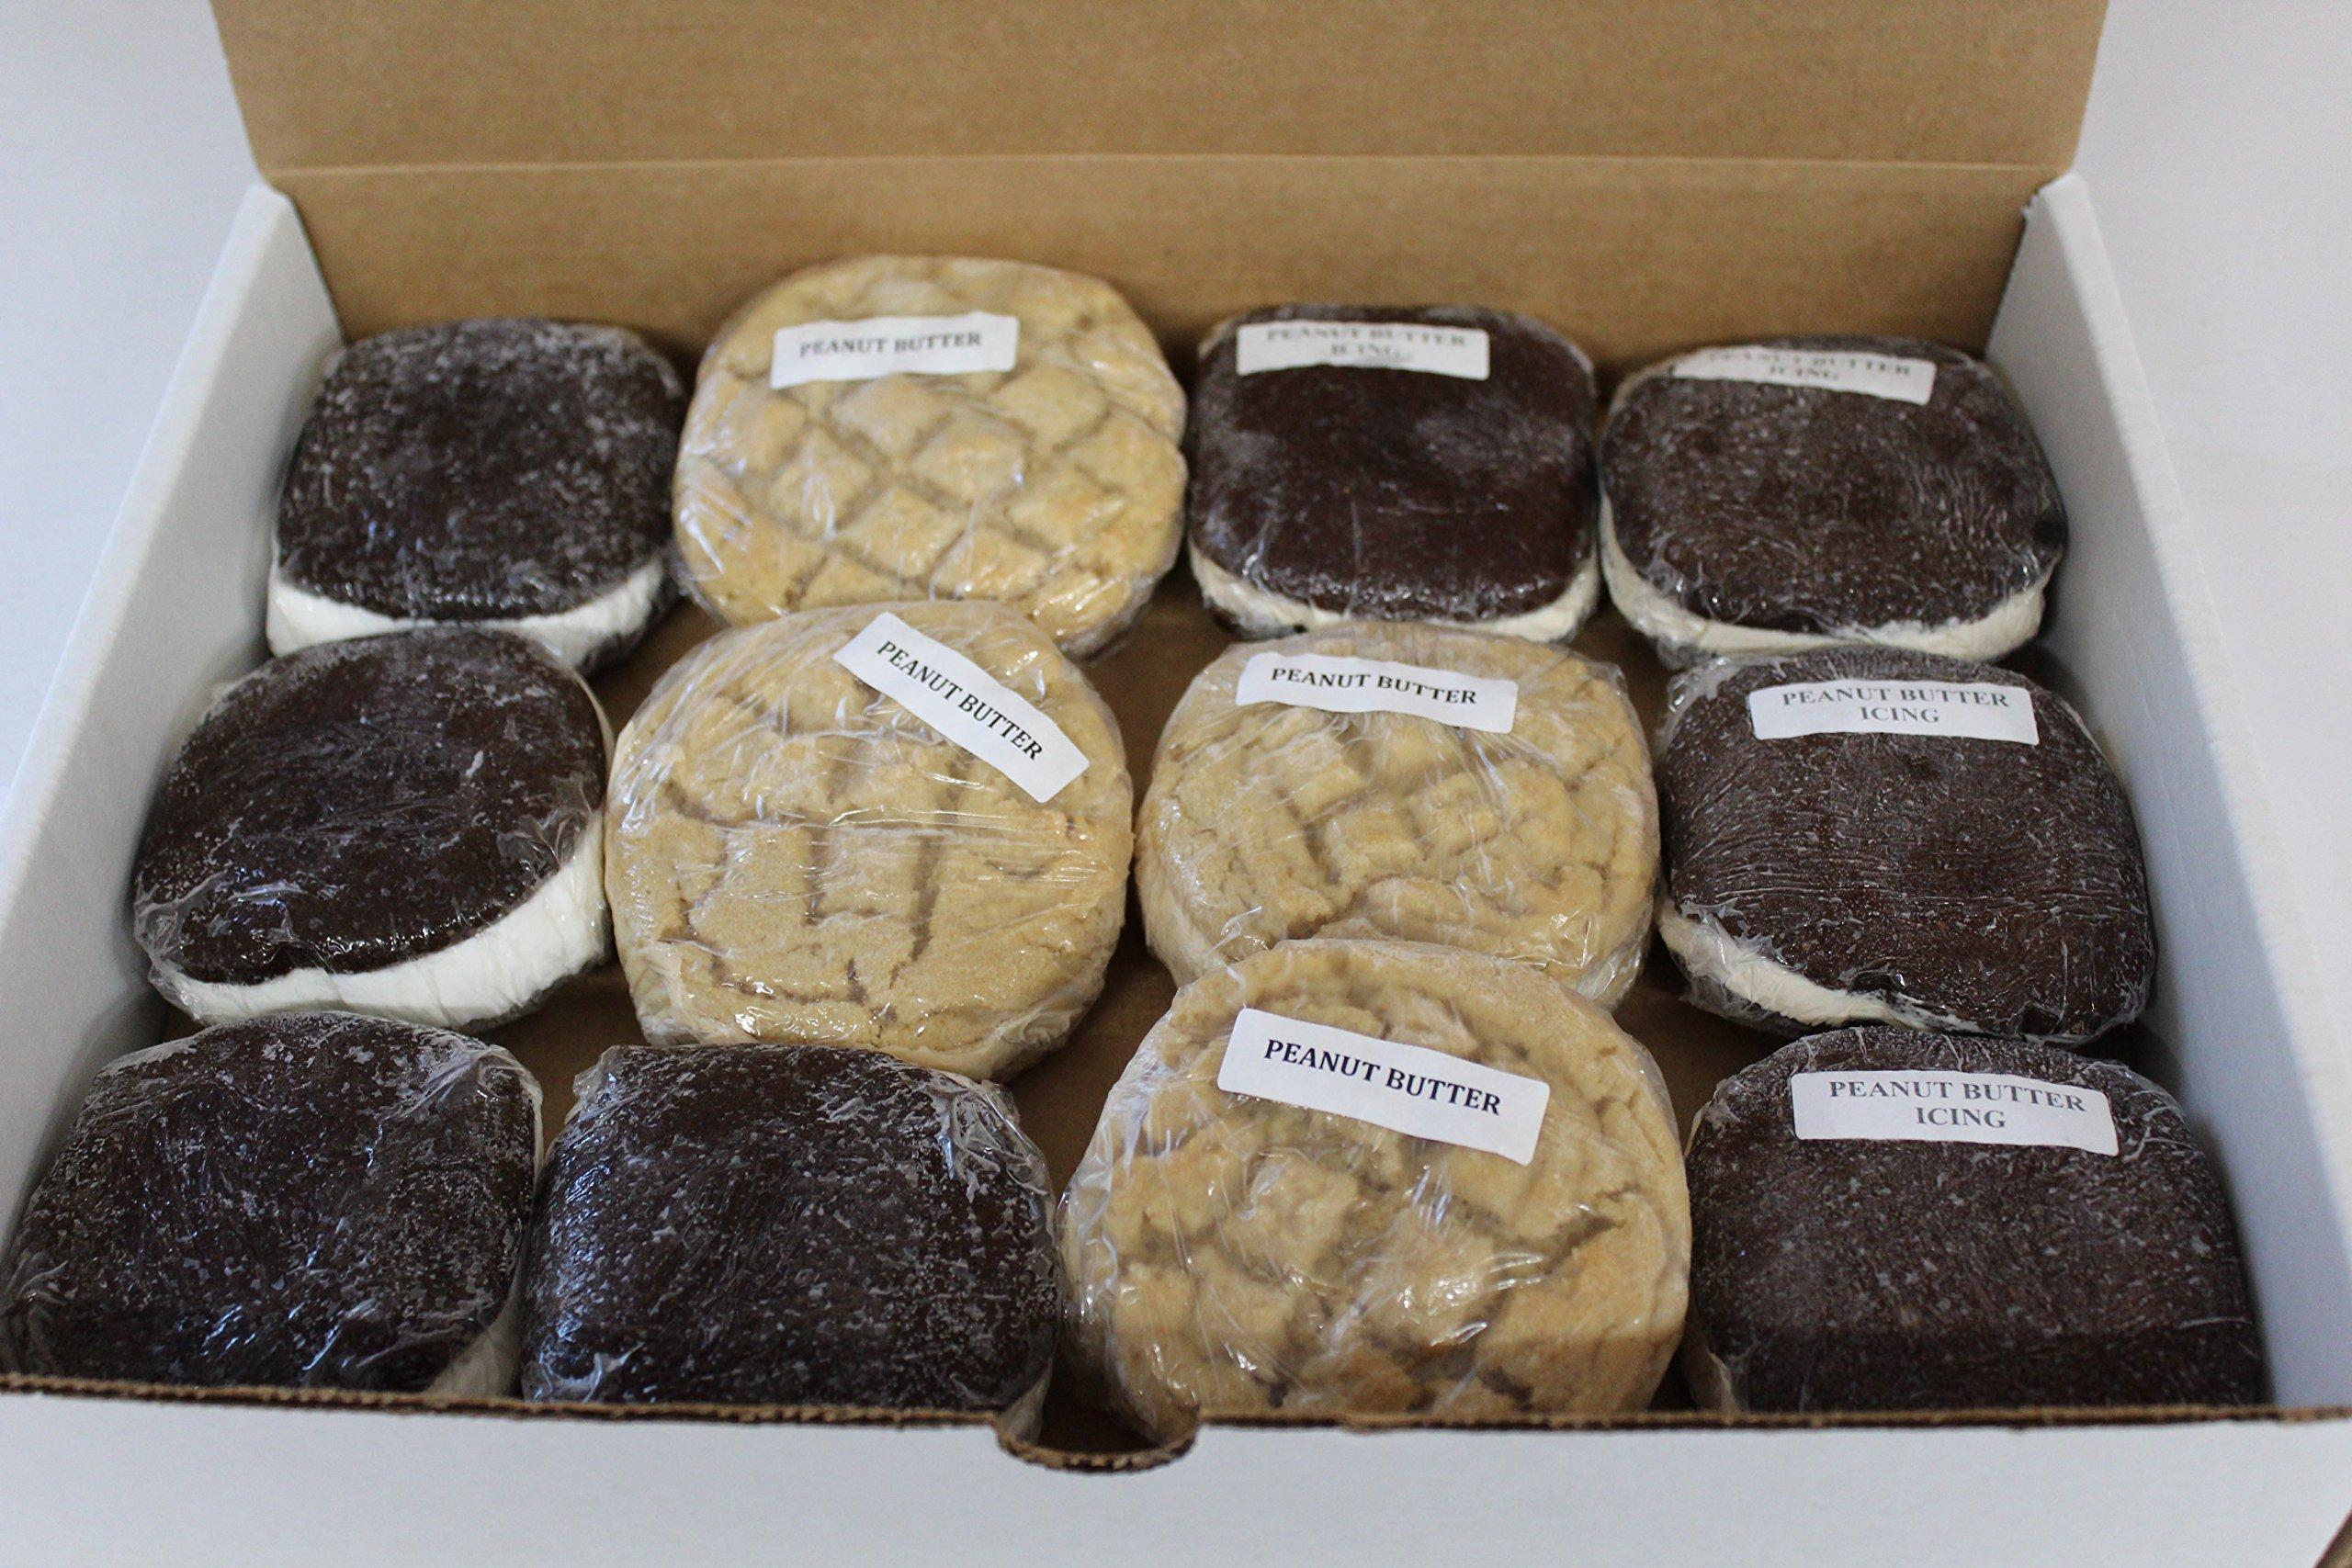 Bird-in-Hand Bake Shop Chocolate Peanut Butter Lovers Whoopie Pies, Favorite Amish Food (Pack of 12)